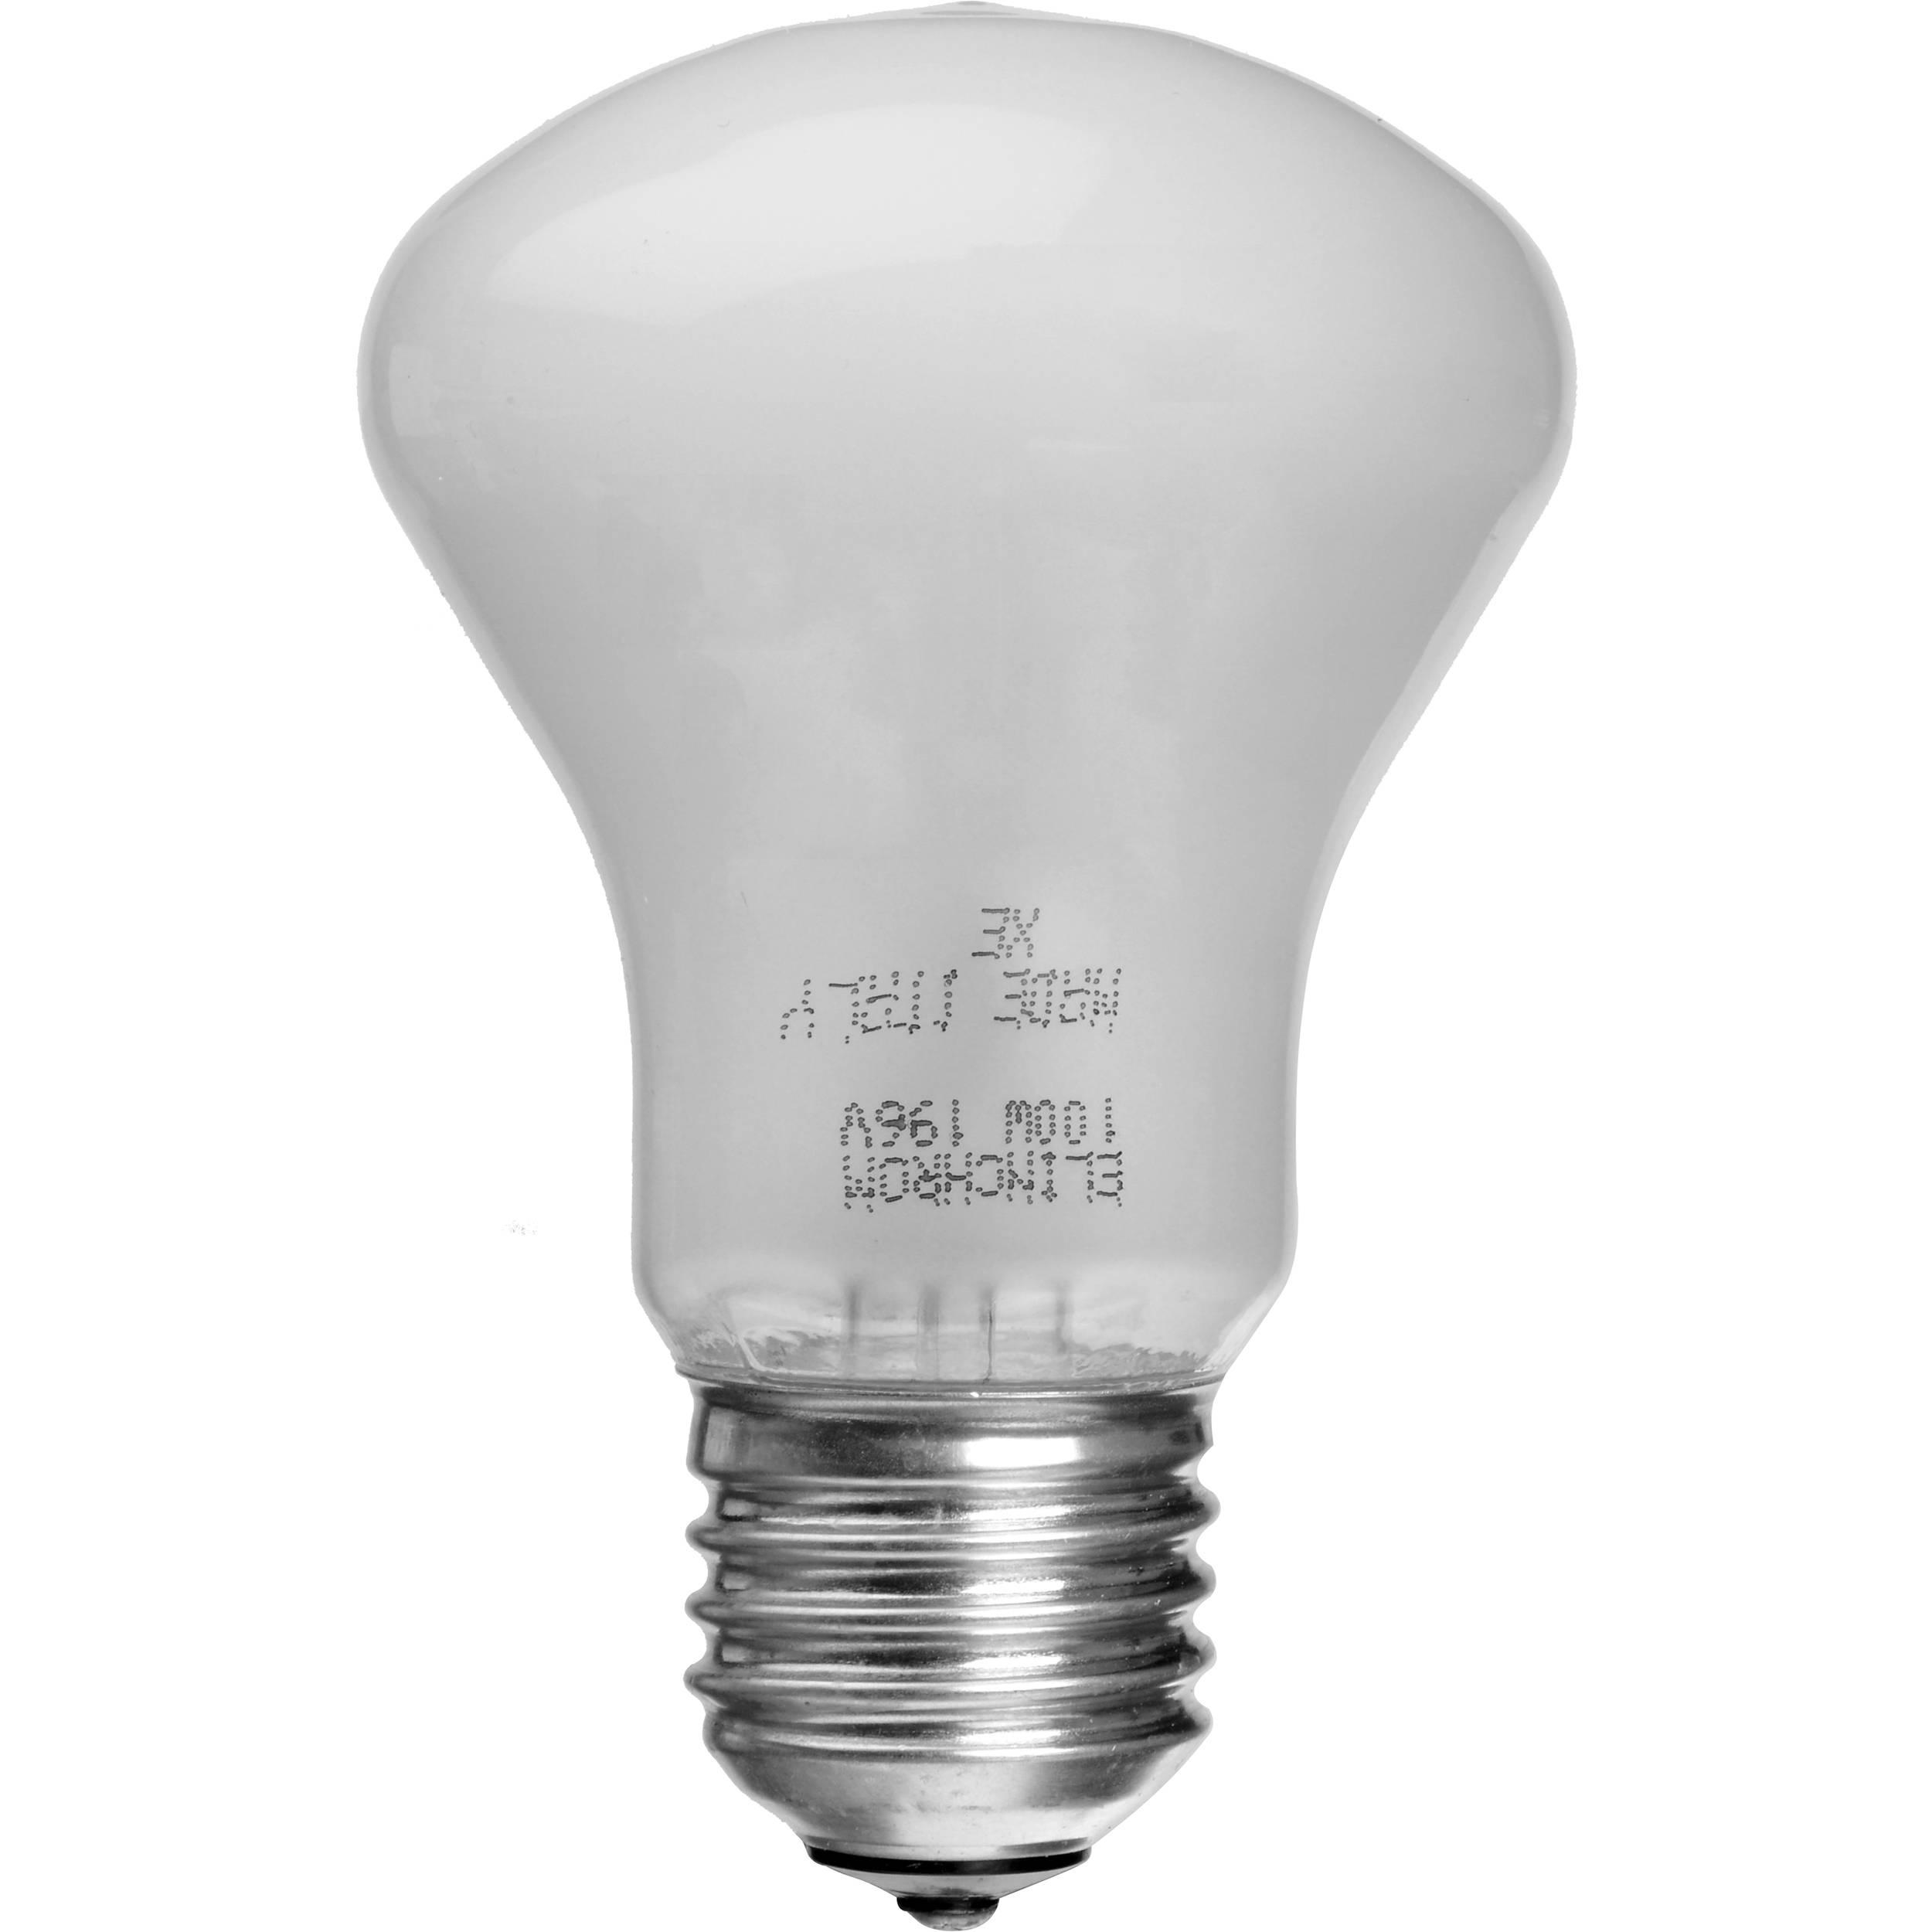 Elinchrom Modeling Lamp 100w 230v El 23002 B H Photo Video